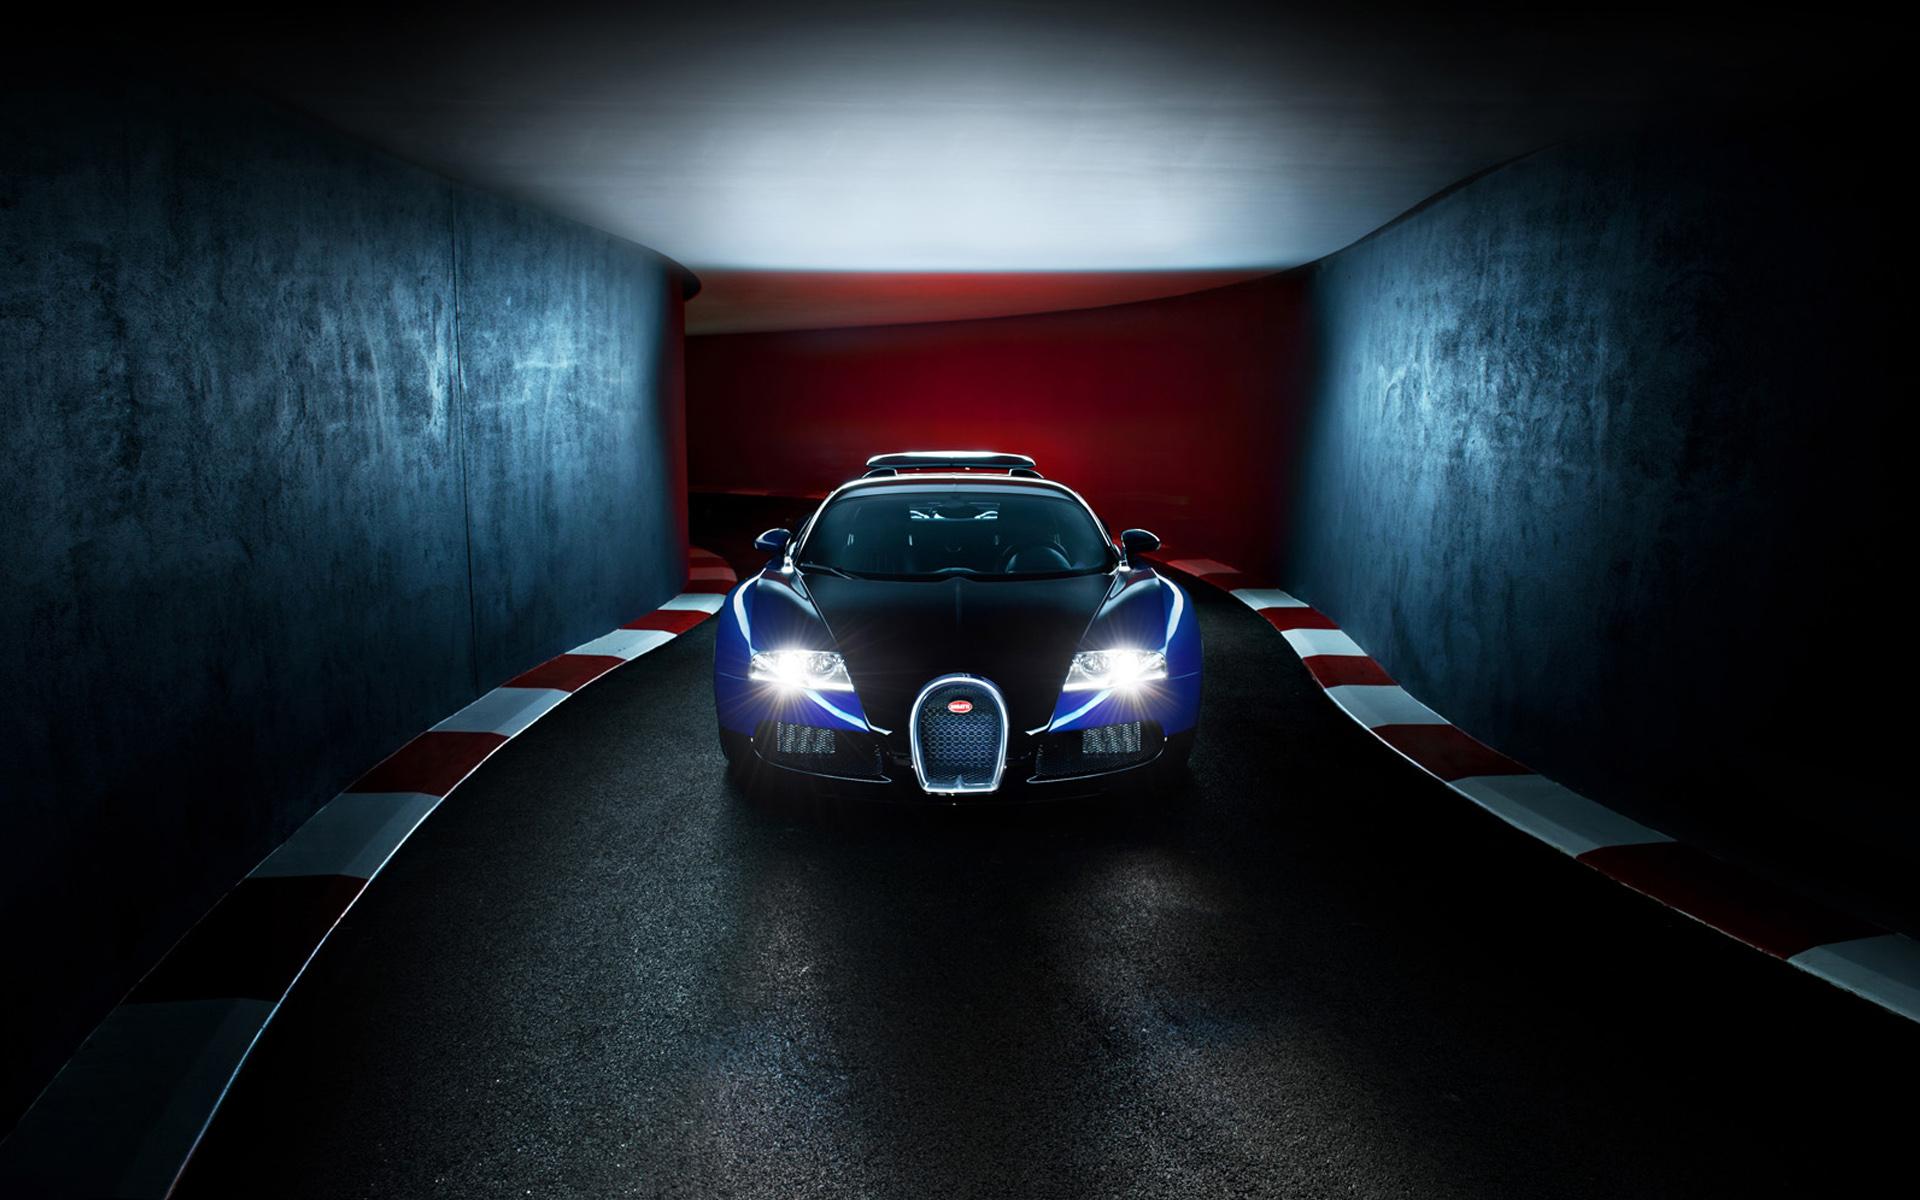 Bugatti Veyron Wallpapers HD Wallpapers 1920x1200